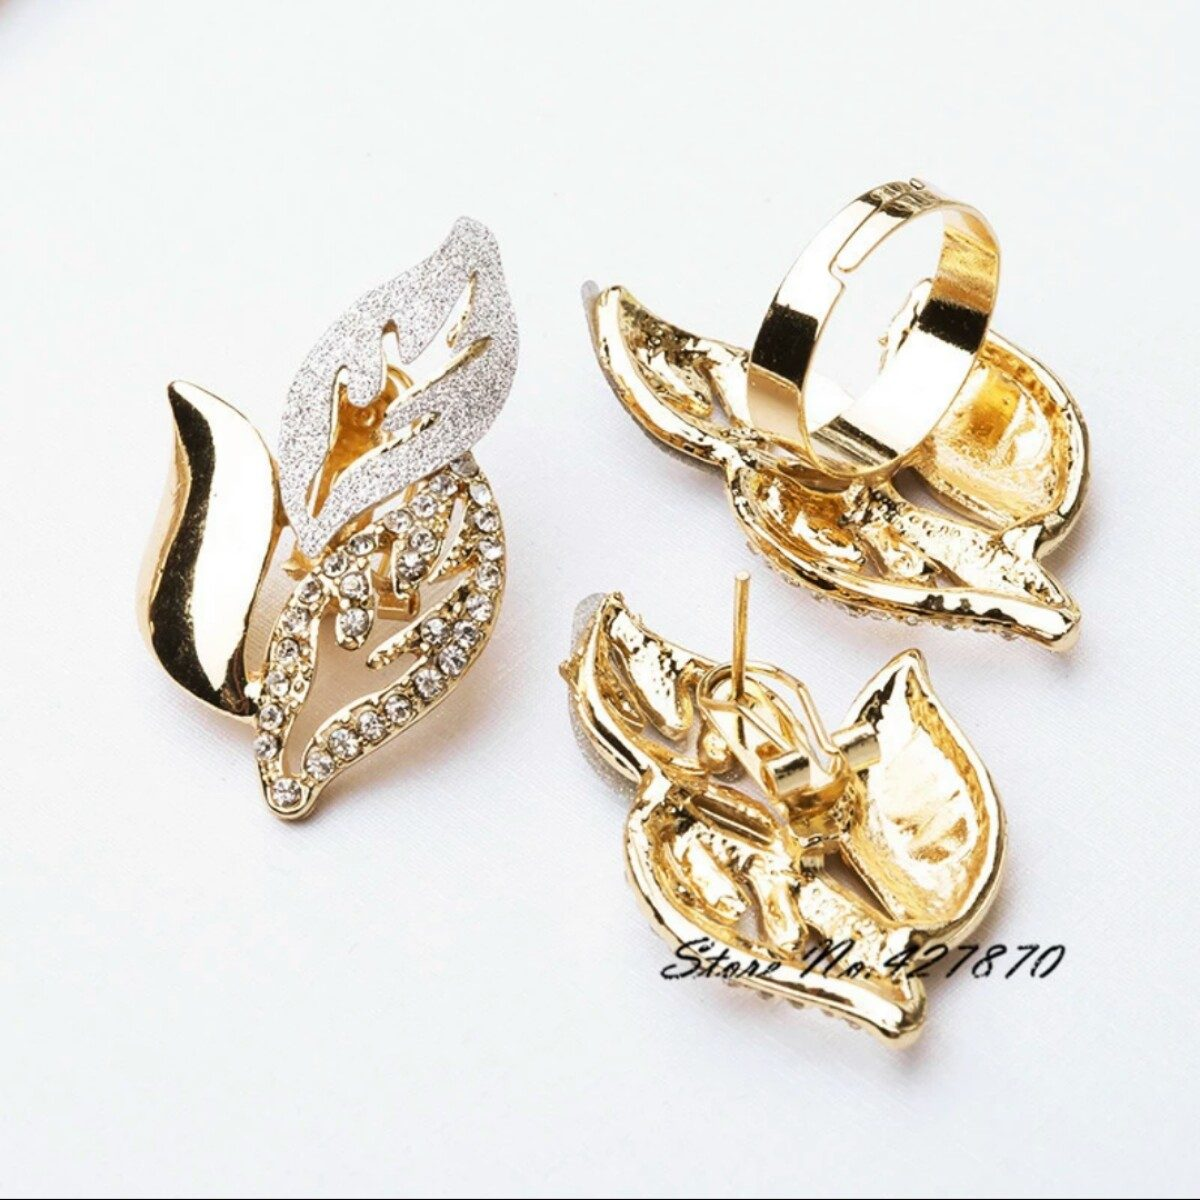 2699a1ffa045 juego de collar oro + pendientes + pulsera + anillo. Cargando zoom.